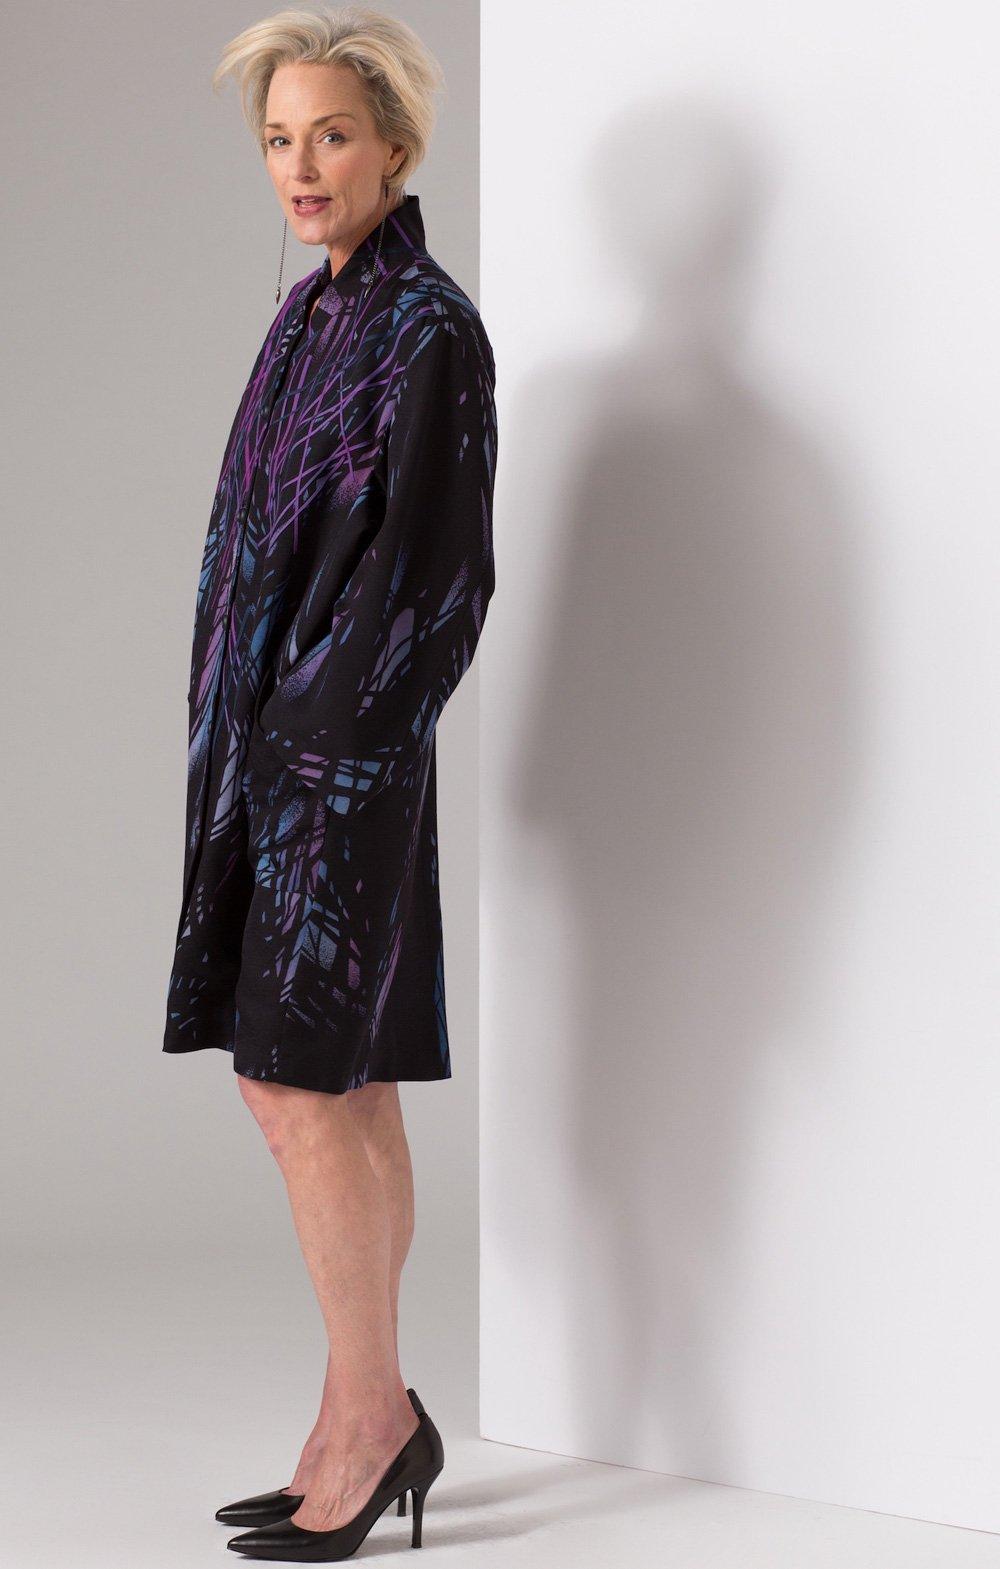 Leaves and Shadows: Appliquéd vintage Japanese kimono silk | Coats | Ann Williamson